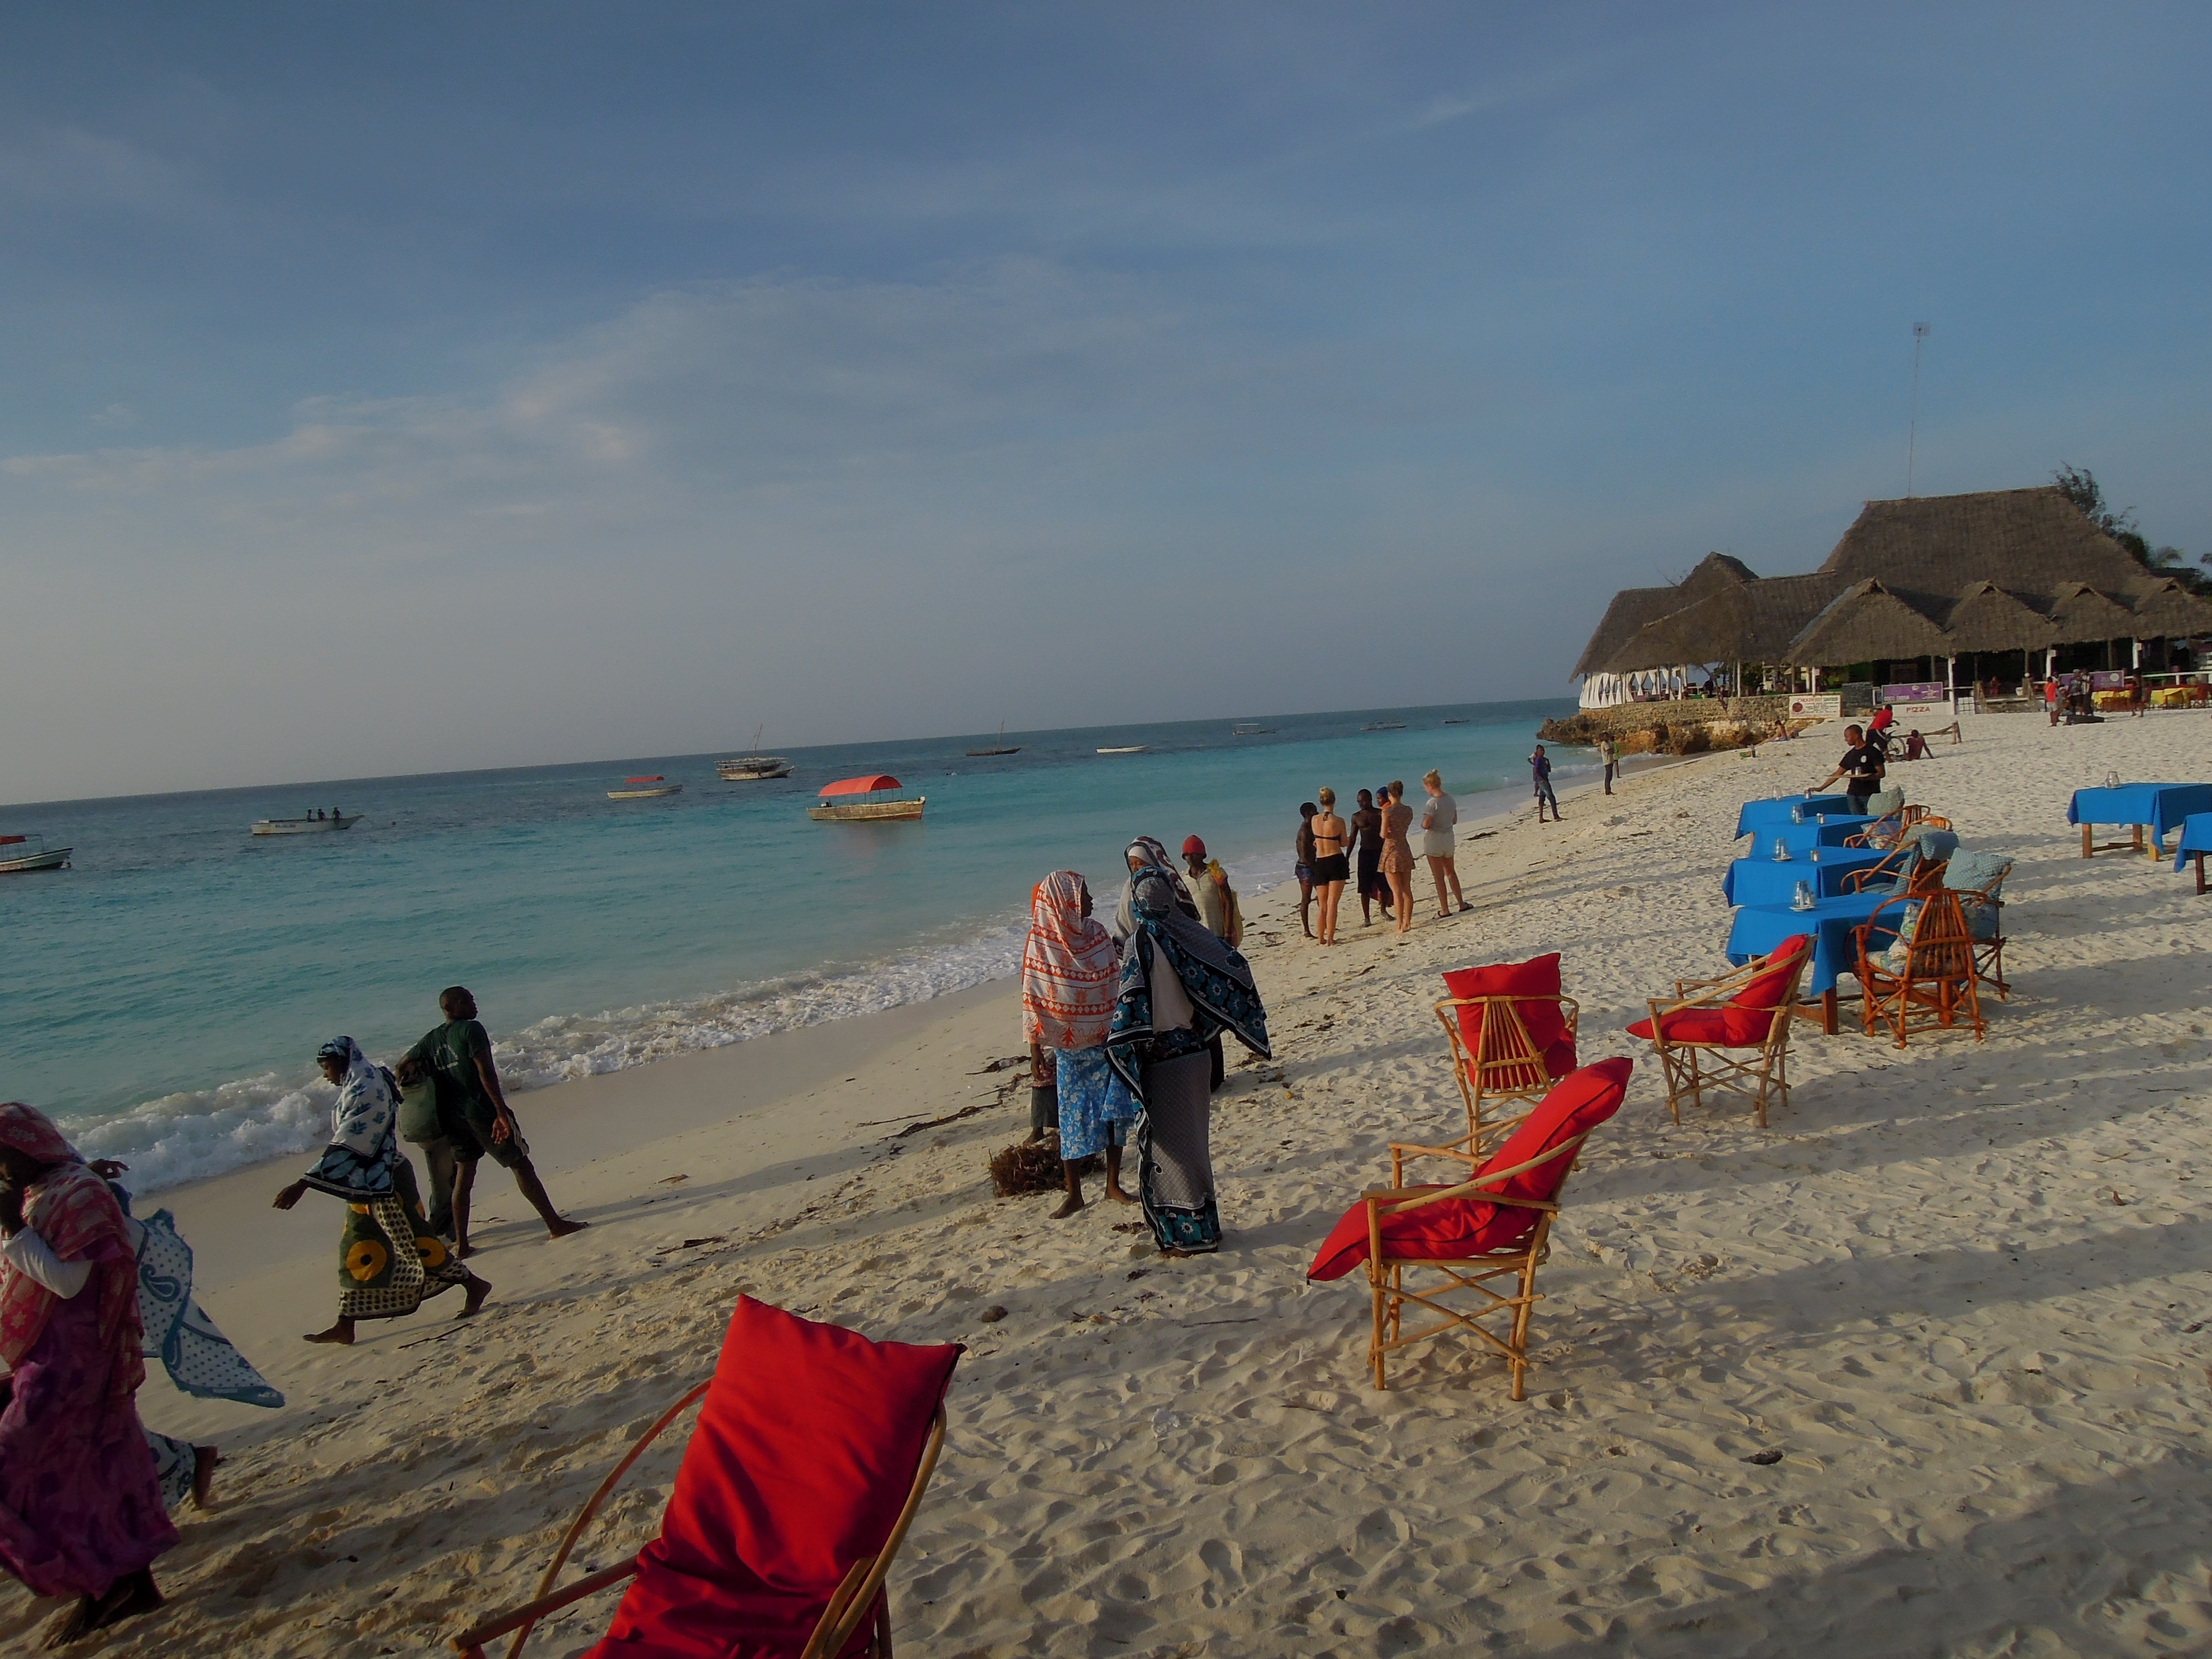 Nungwi, Zanzibar, Tanzania, fot. M. Lehrmann